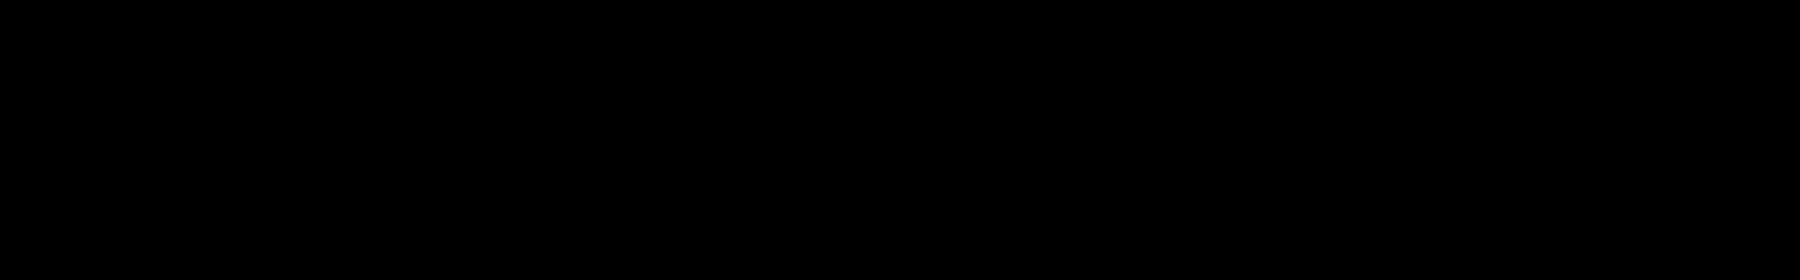 RAZOR'S EDGE Bundle audio waveform